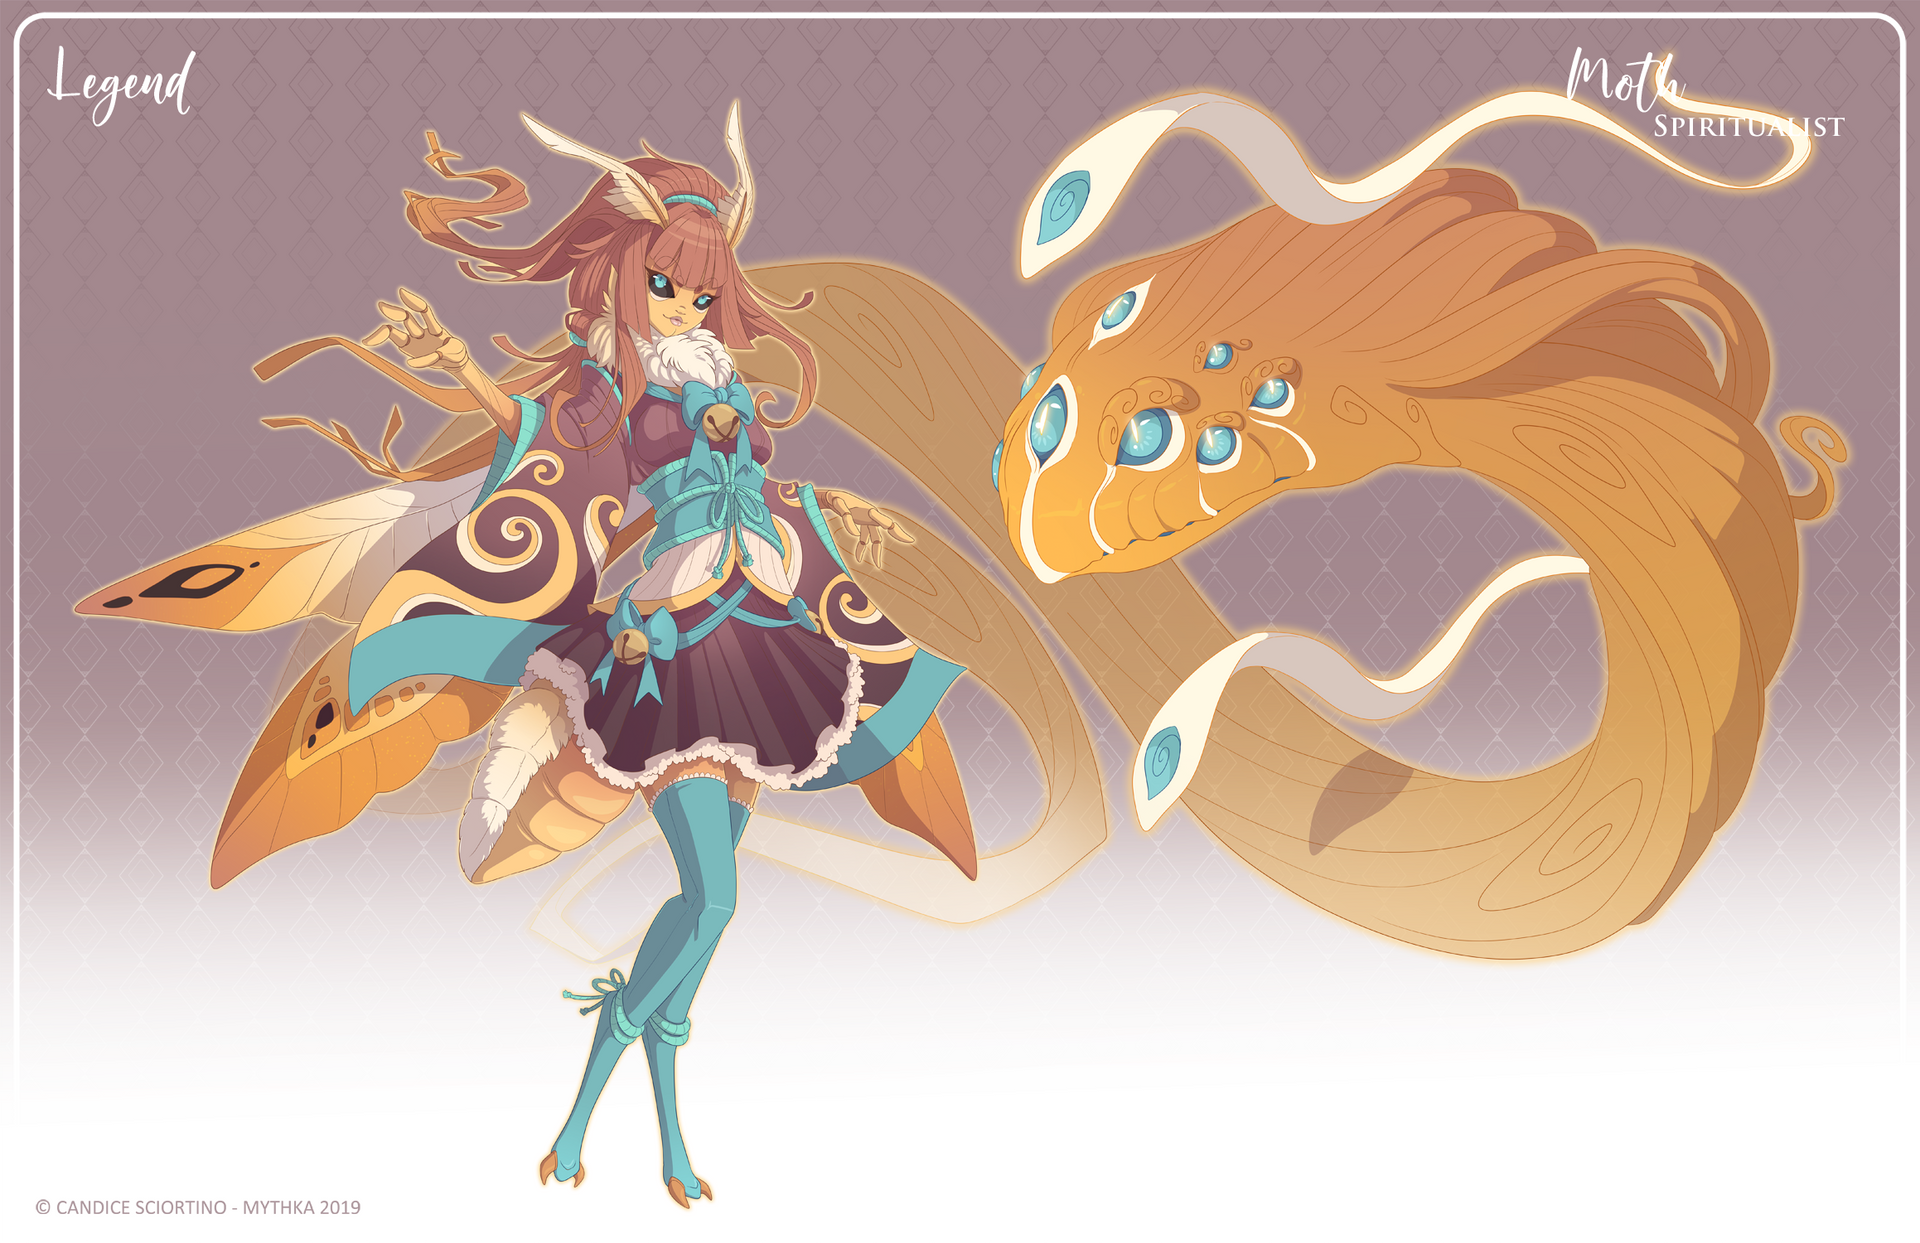 084 - (Legend) Moth Spiritualist by Mythka on DeviantArt